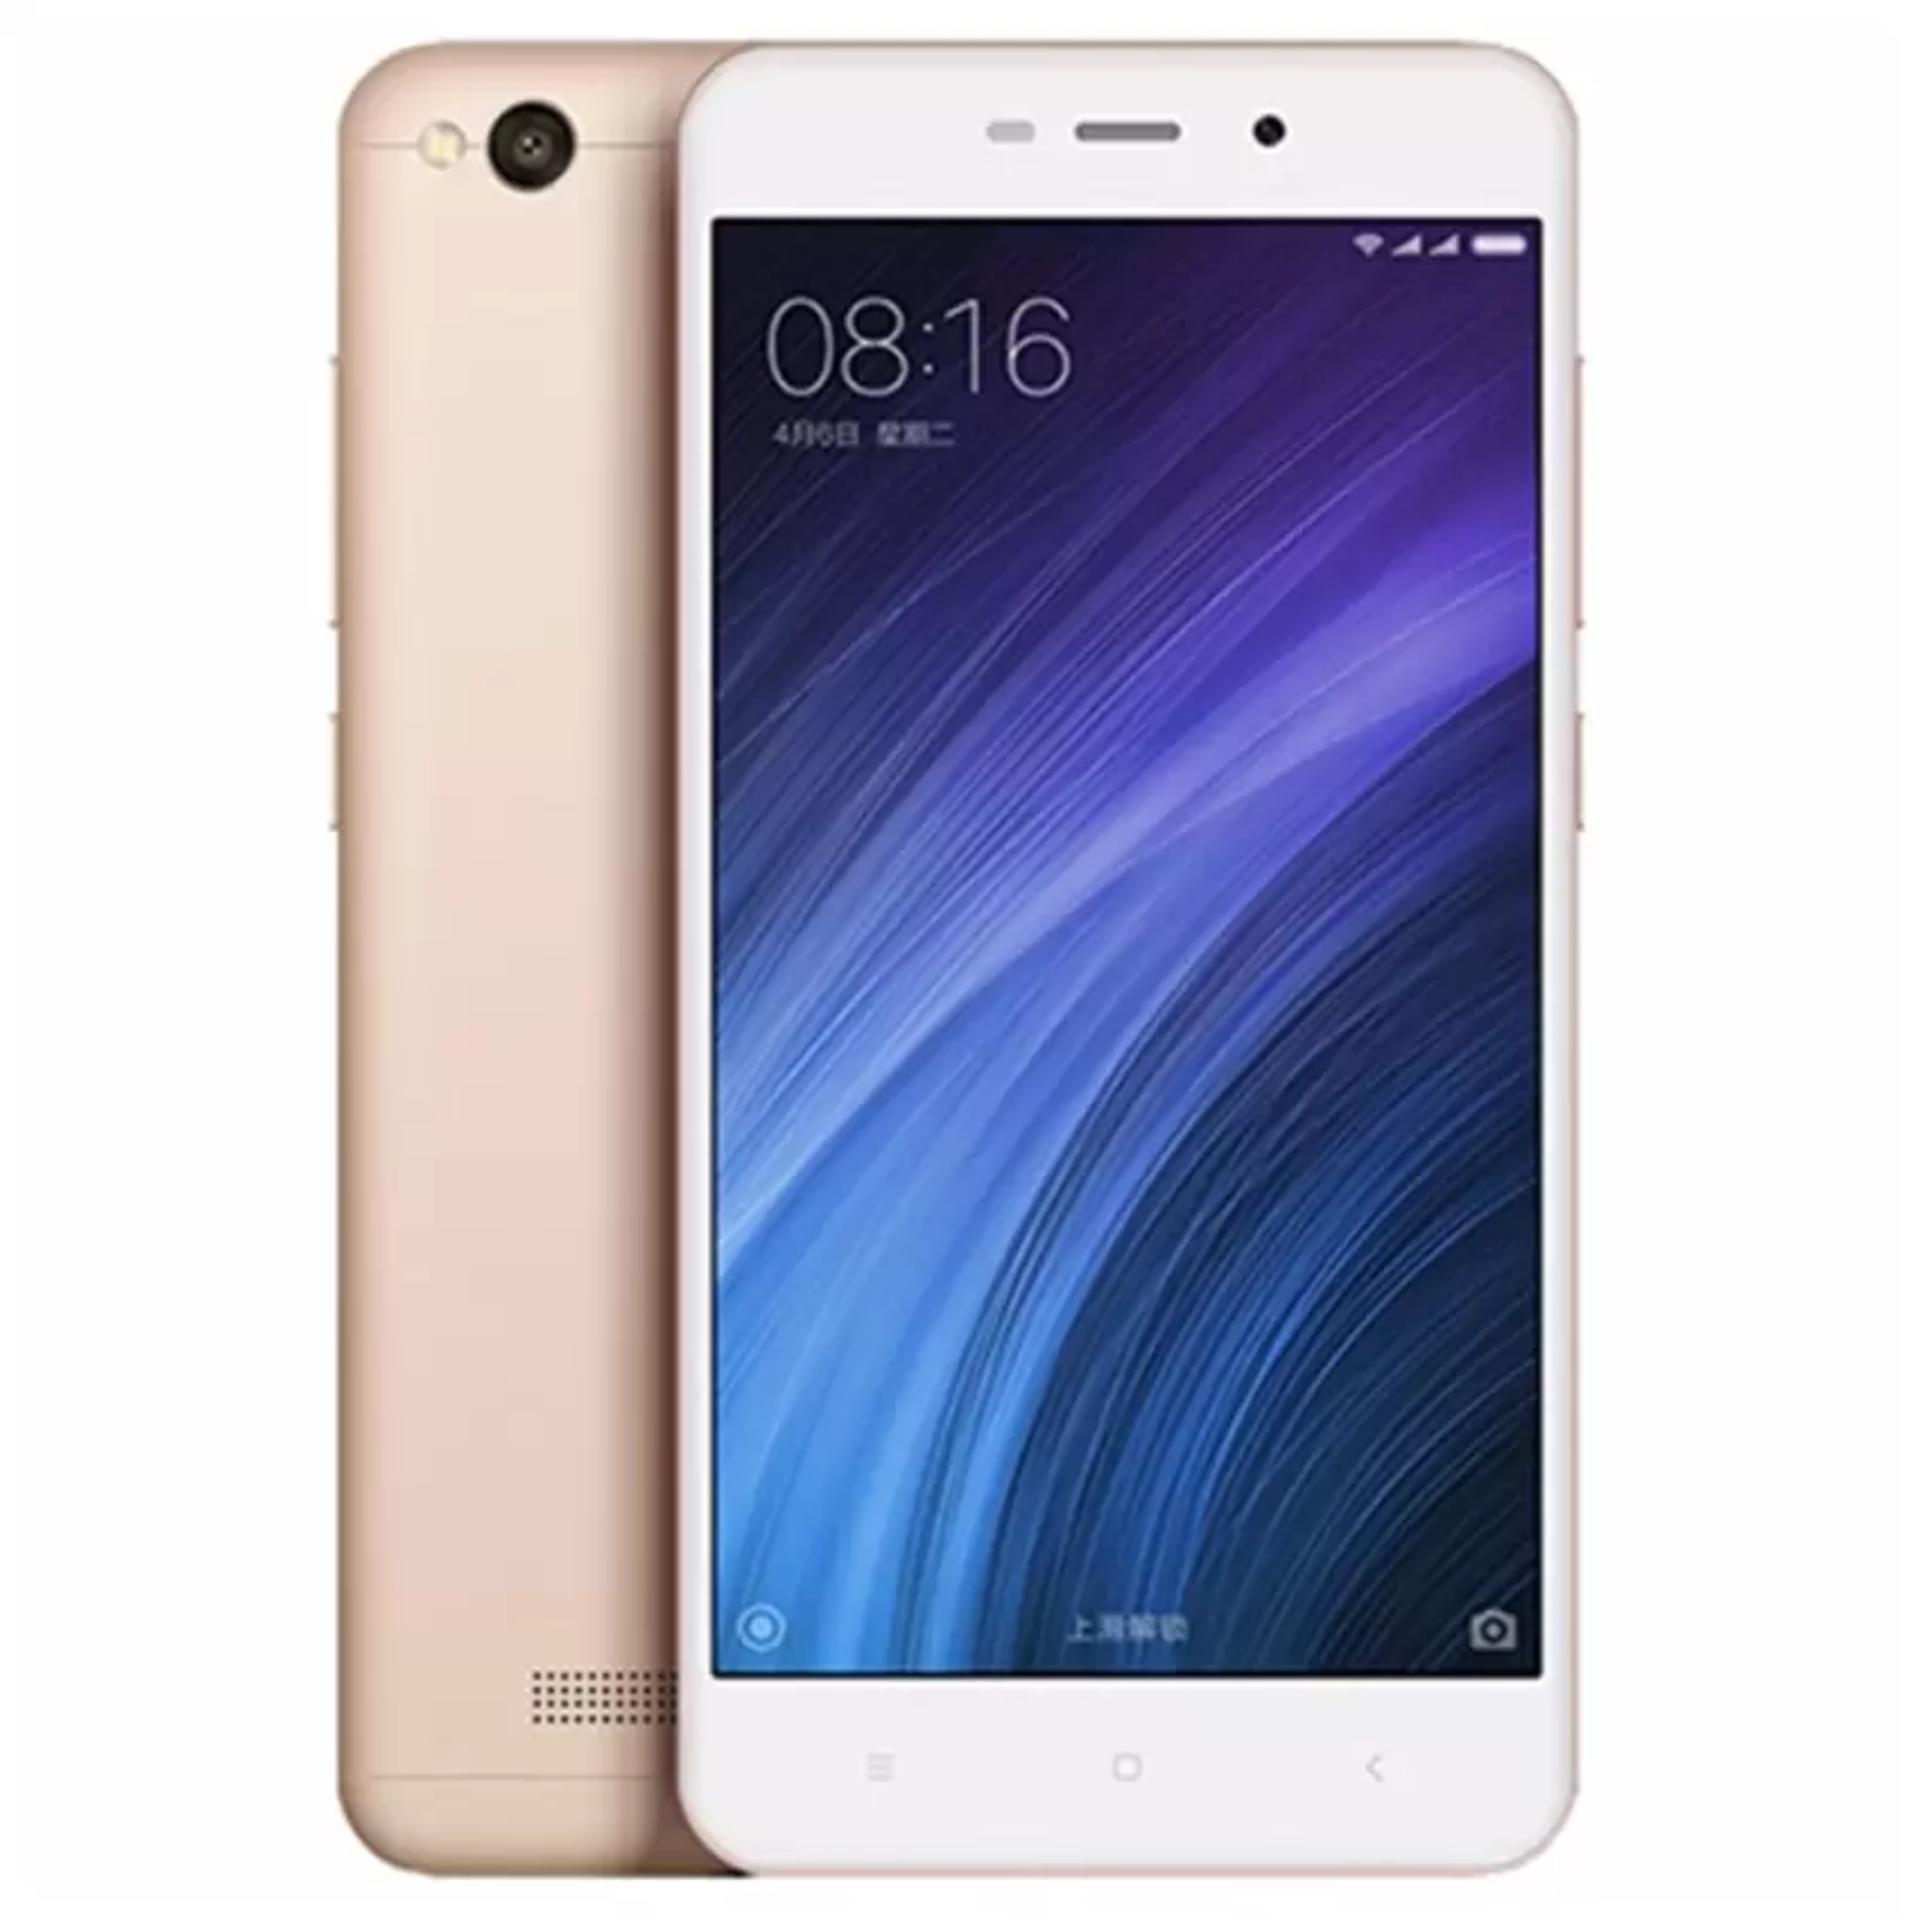 Beli Xiaomi Redmi 4A 16Gb Gold Ready Bahasa Indonesia 4G Pakai Kartu Kredit